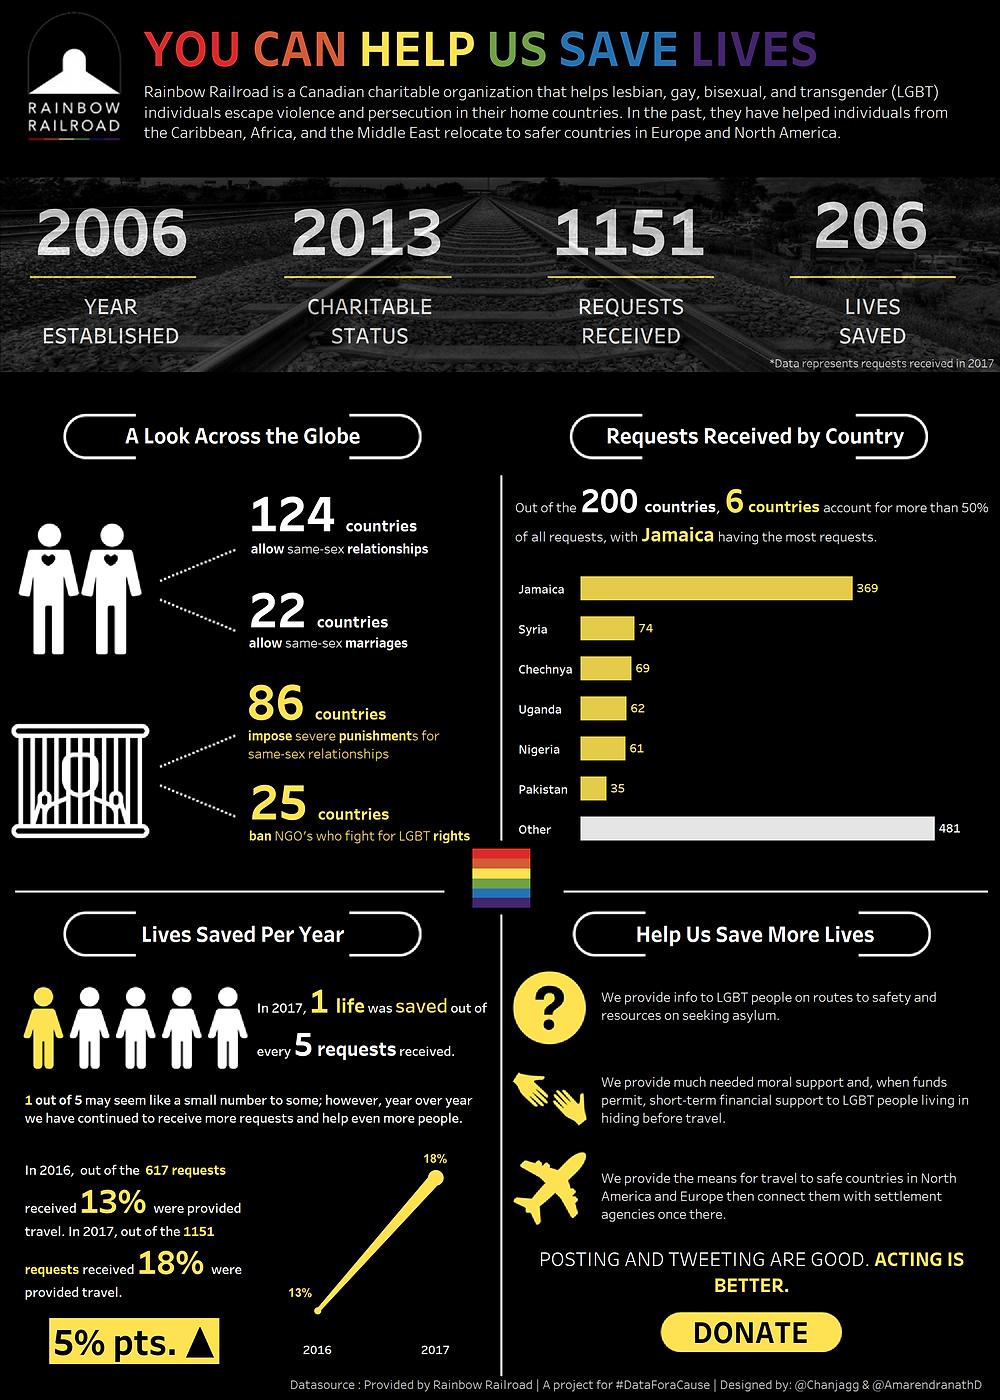 Data visualization by Amarendranath & Chantilly